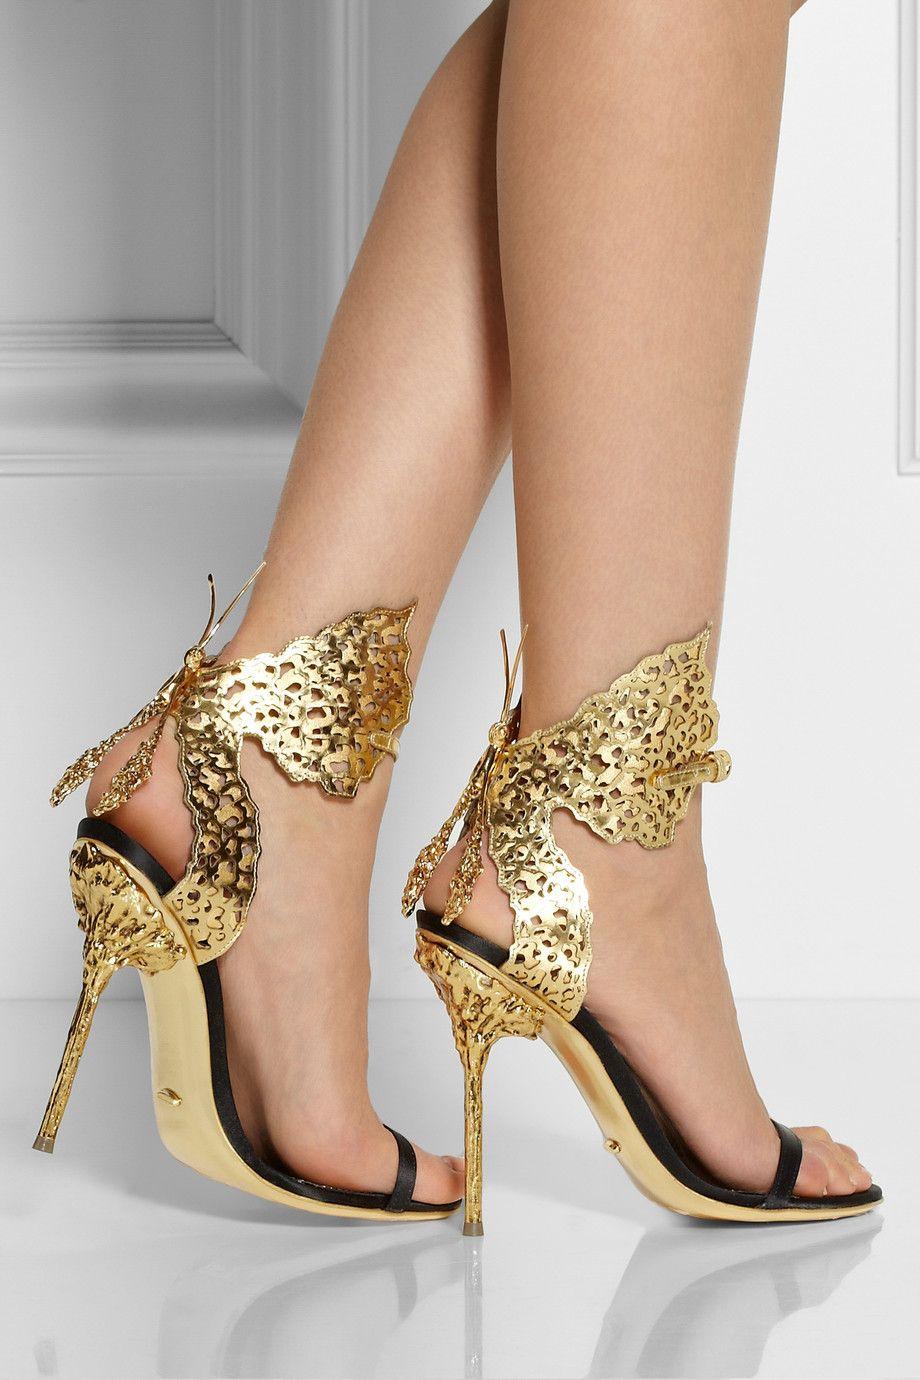 ab35f16b2852 Brand: Sergio Rossi | #Cutout #Gold #Metallic #Satin #Leather #Sandals  #Shoes #Women